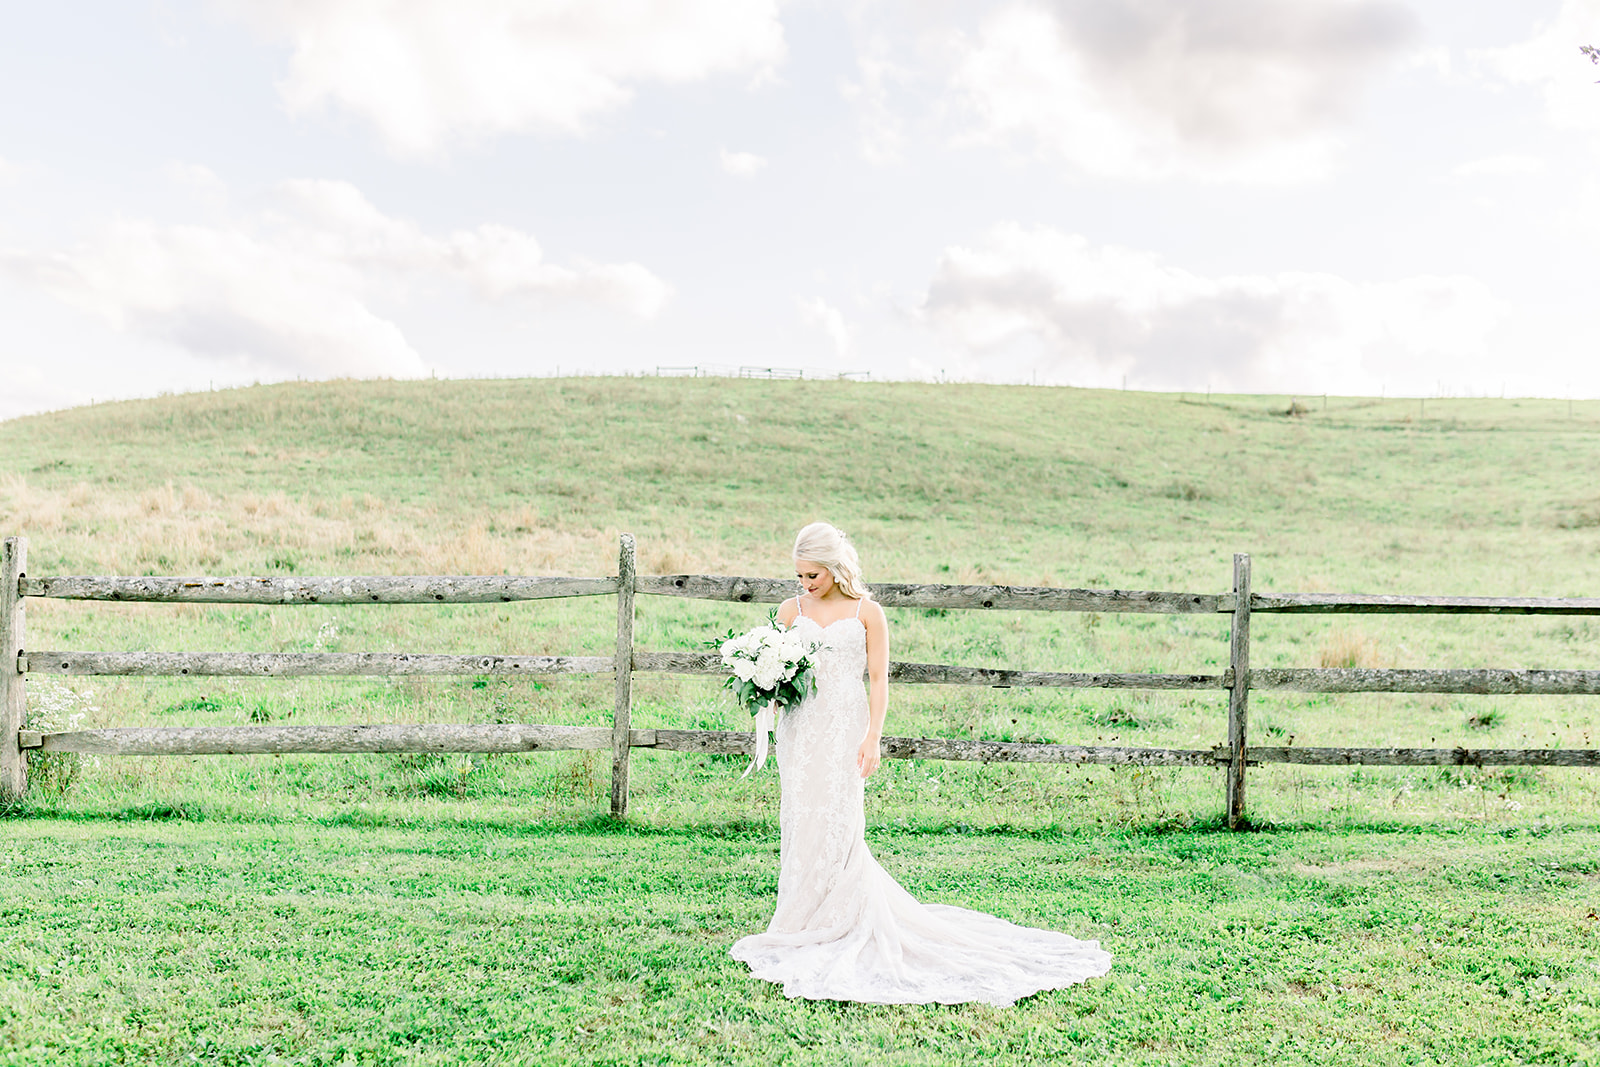 Armstrong Farms Rustic Farm Wedding_Krystal Healy Photography.jpg